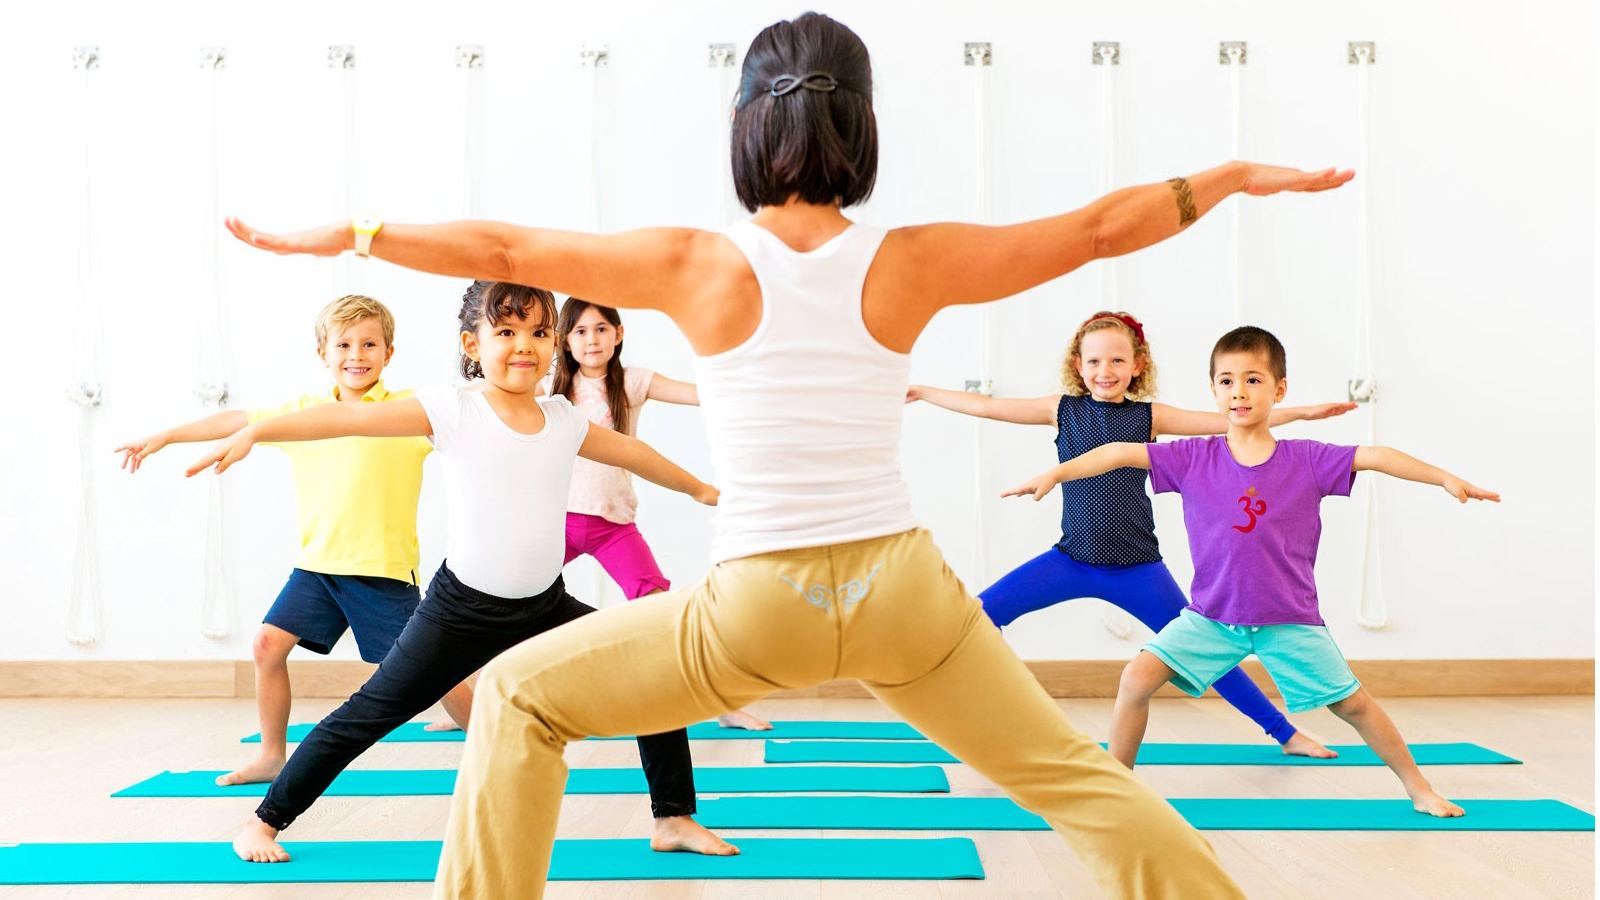 Kids Yoga Workshop During Cumberplunge At Wellness Yoga Of Bristol Downtown Bristol Events Believe In Bristol Historic Downtown Tn Va